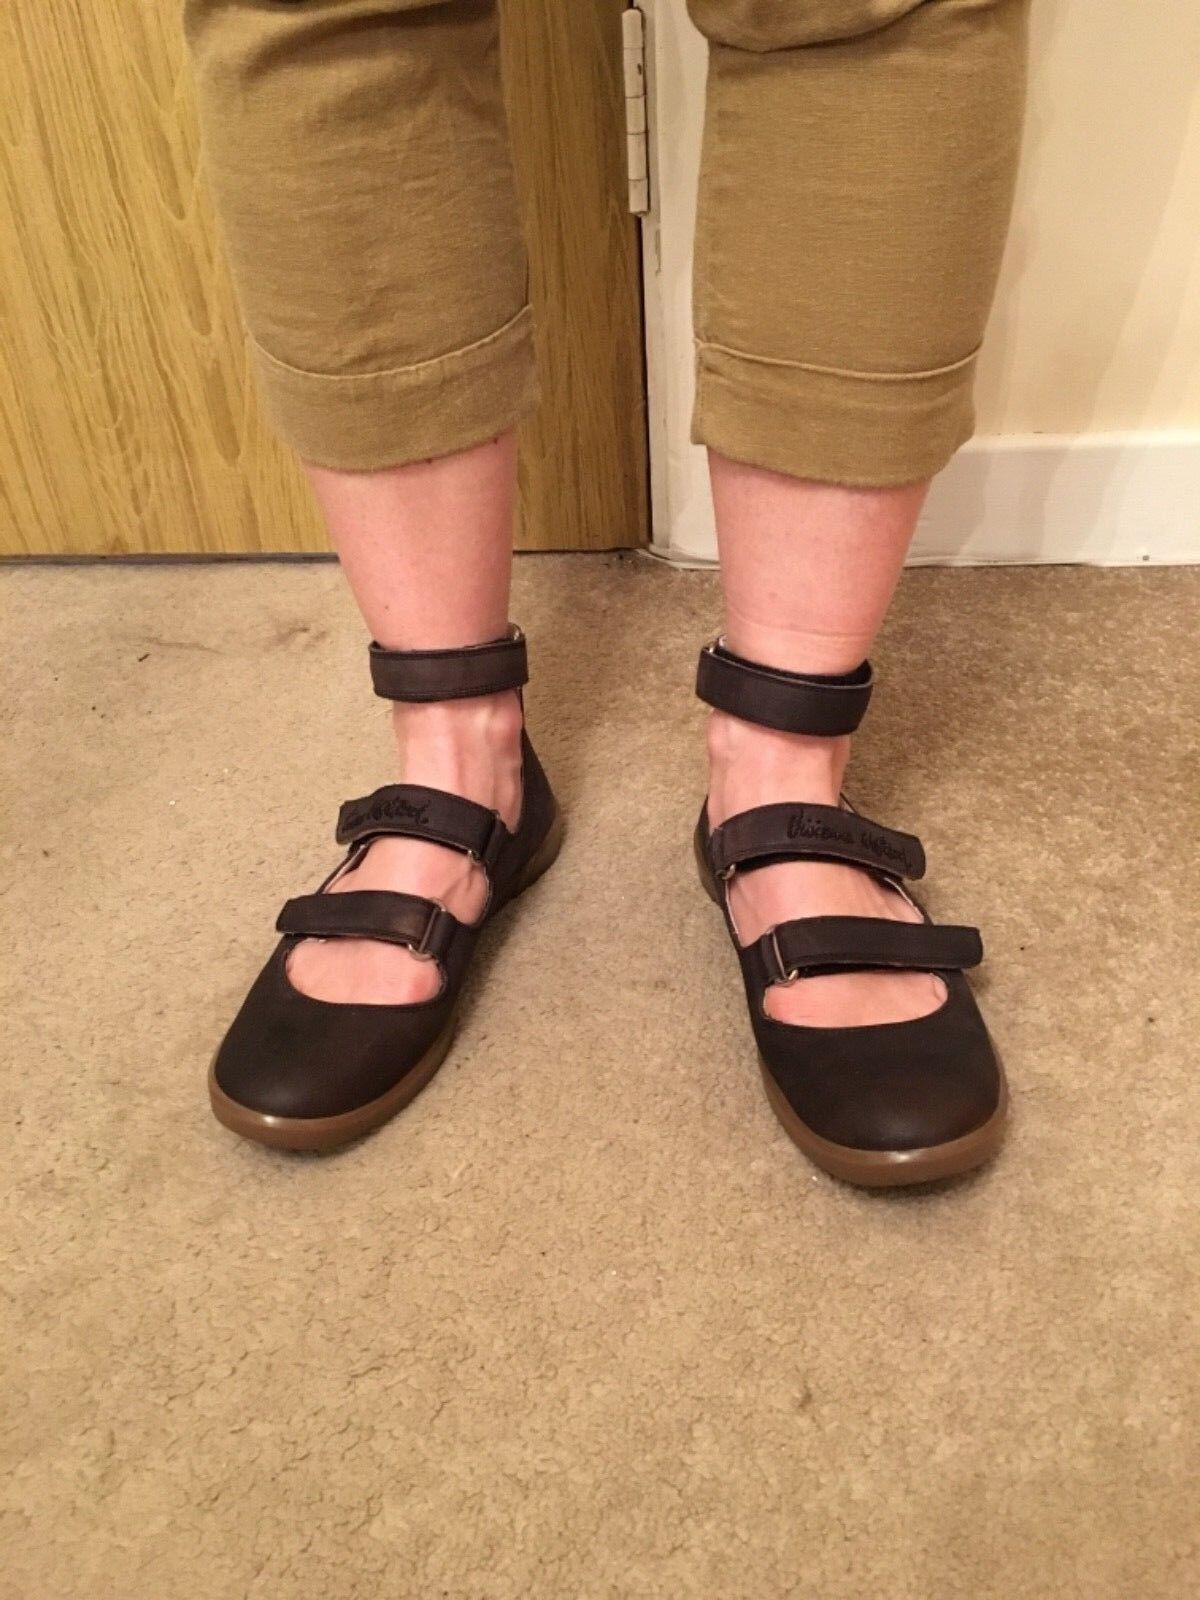 Marrón Vivienne Westwood Sandalia Zapatos-Talla Zapatos-Talla Zapatos-Talla 37 UK 4  hasta un 50% de descuento